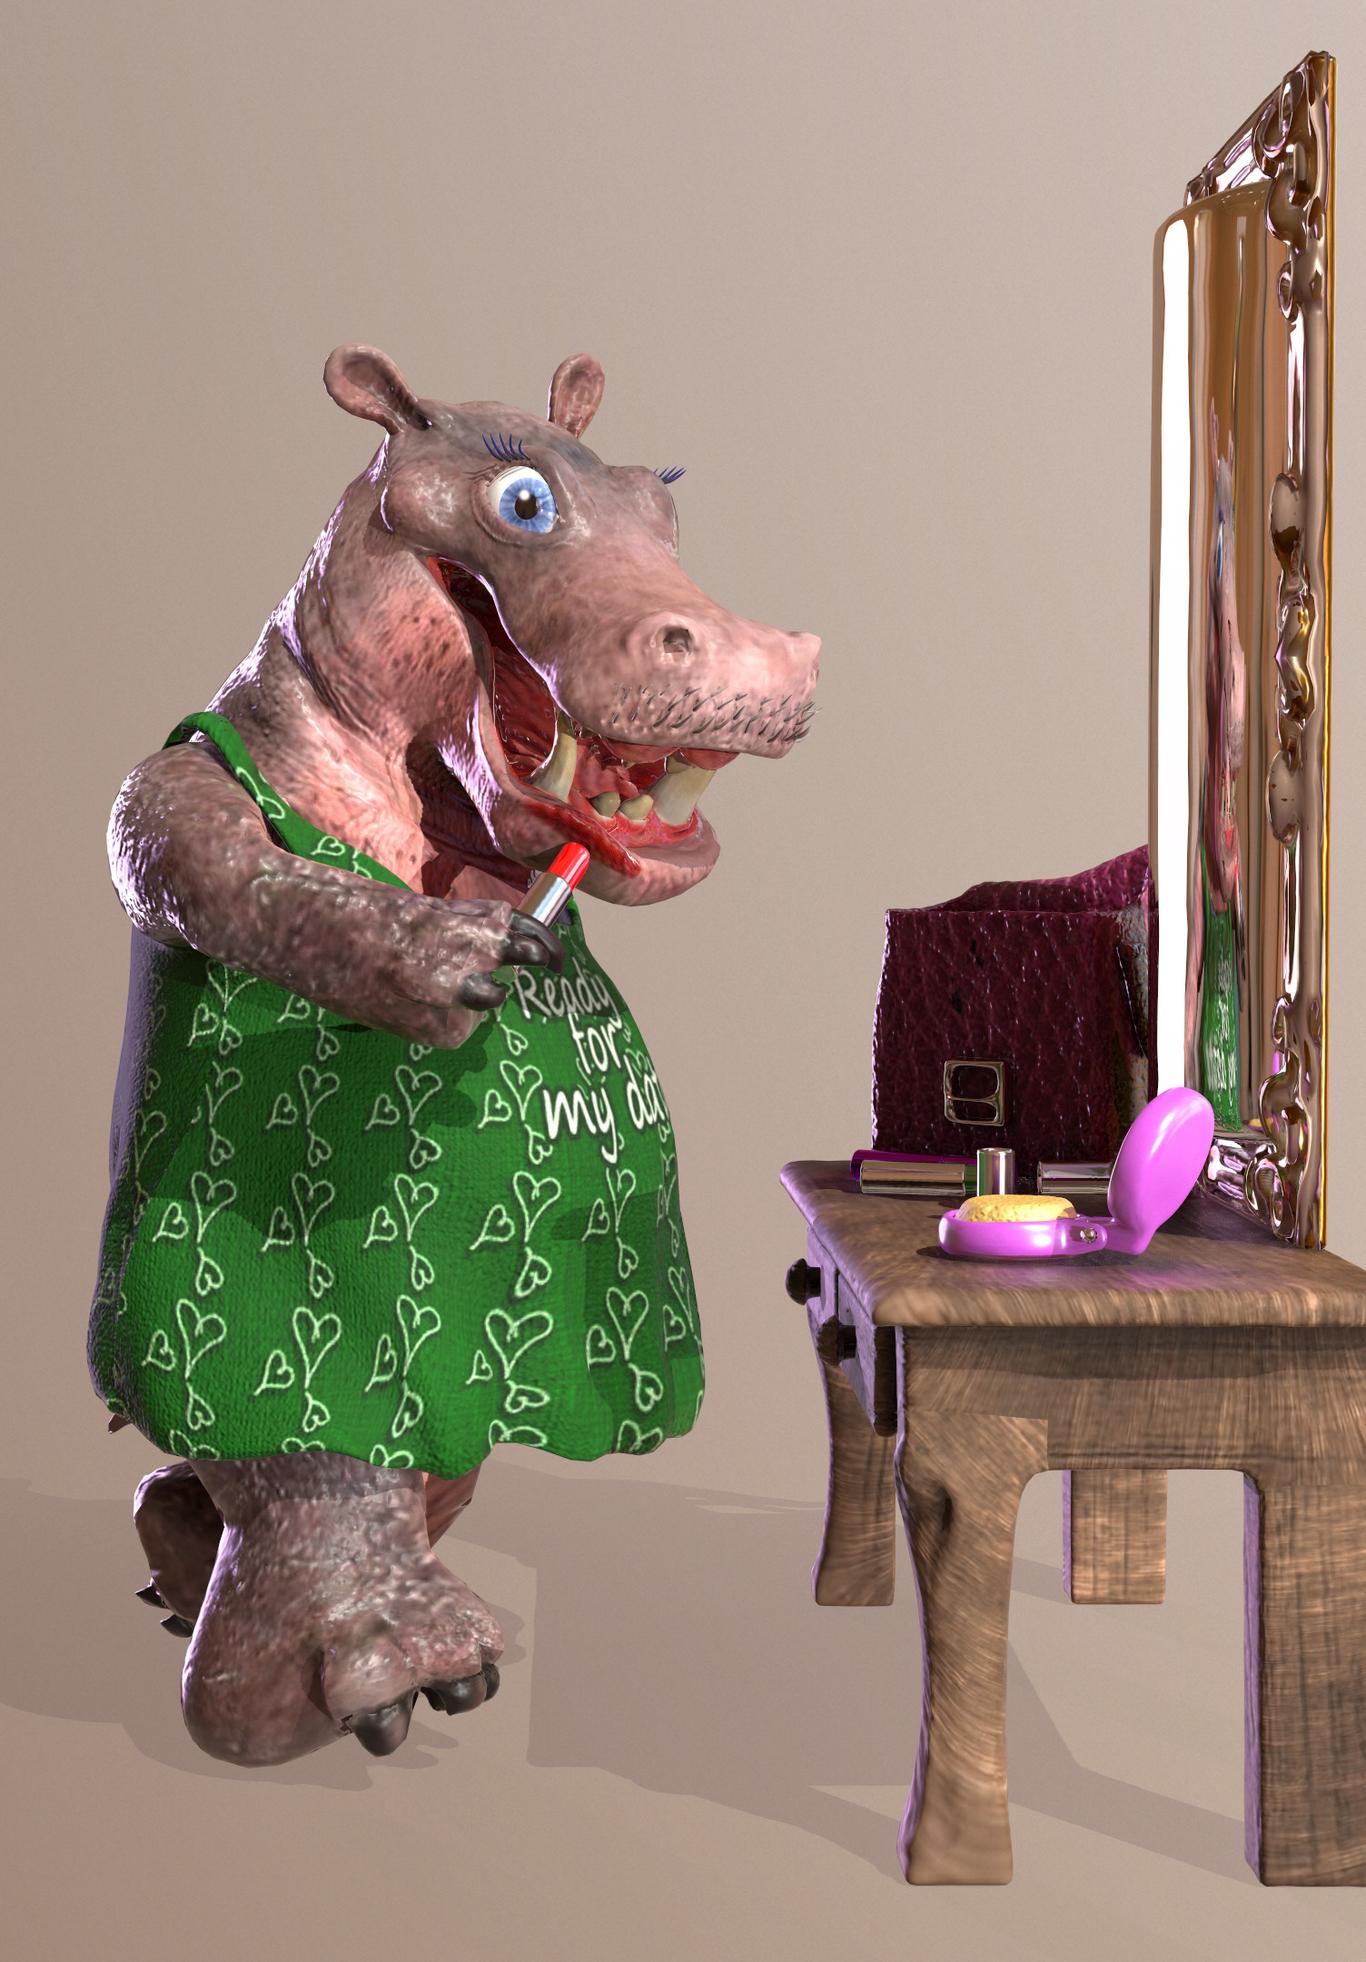 Rabaman71 hippo beauty 1 929c2d43 gcqa